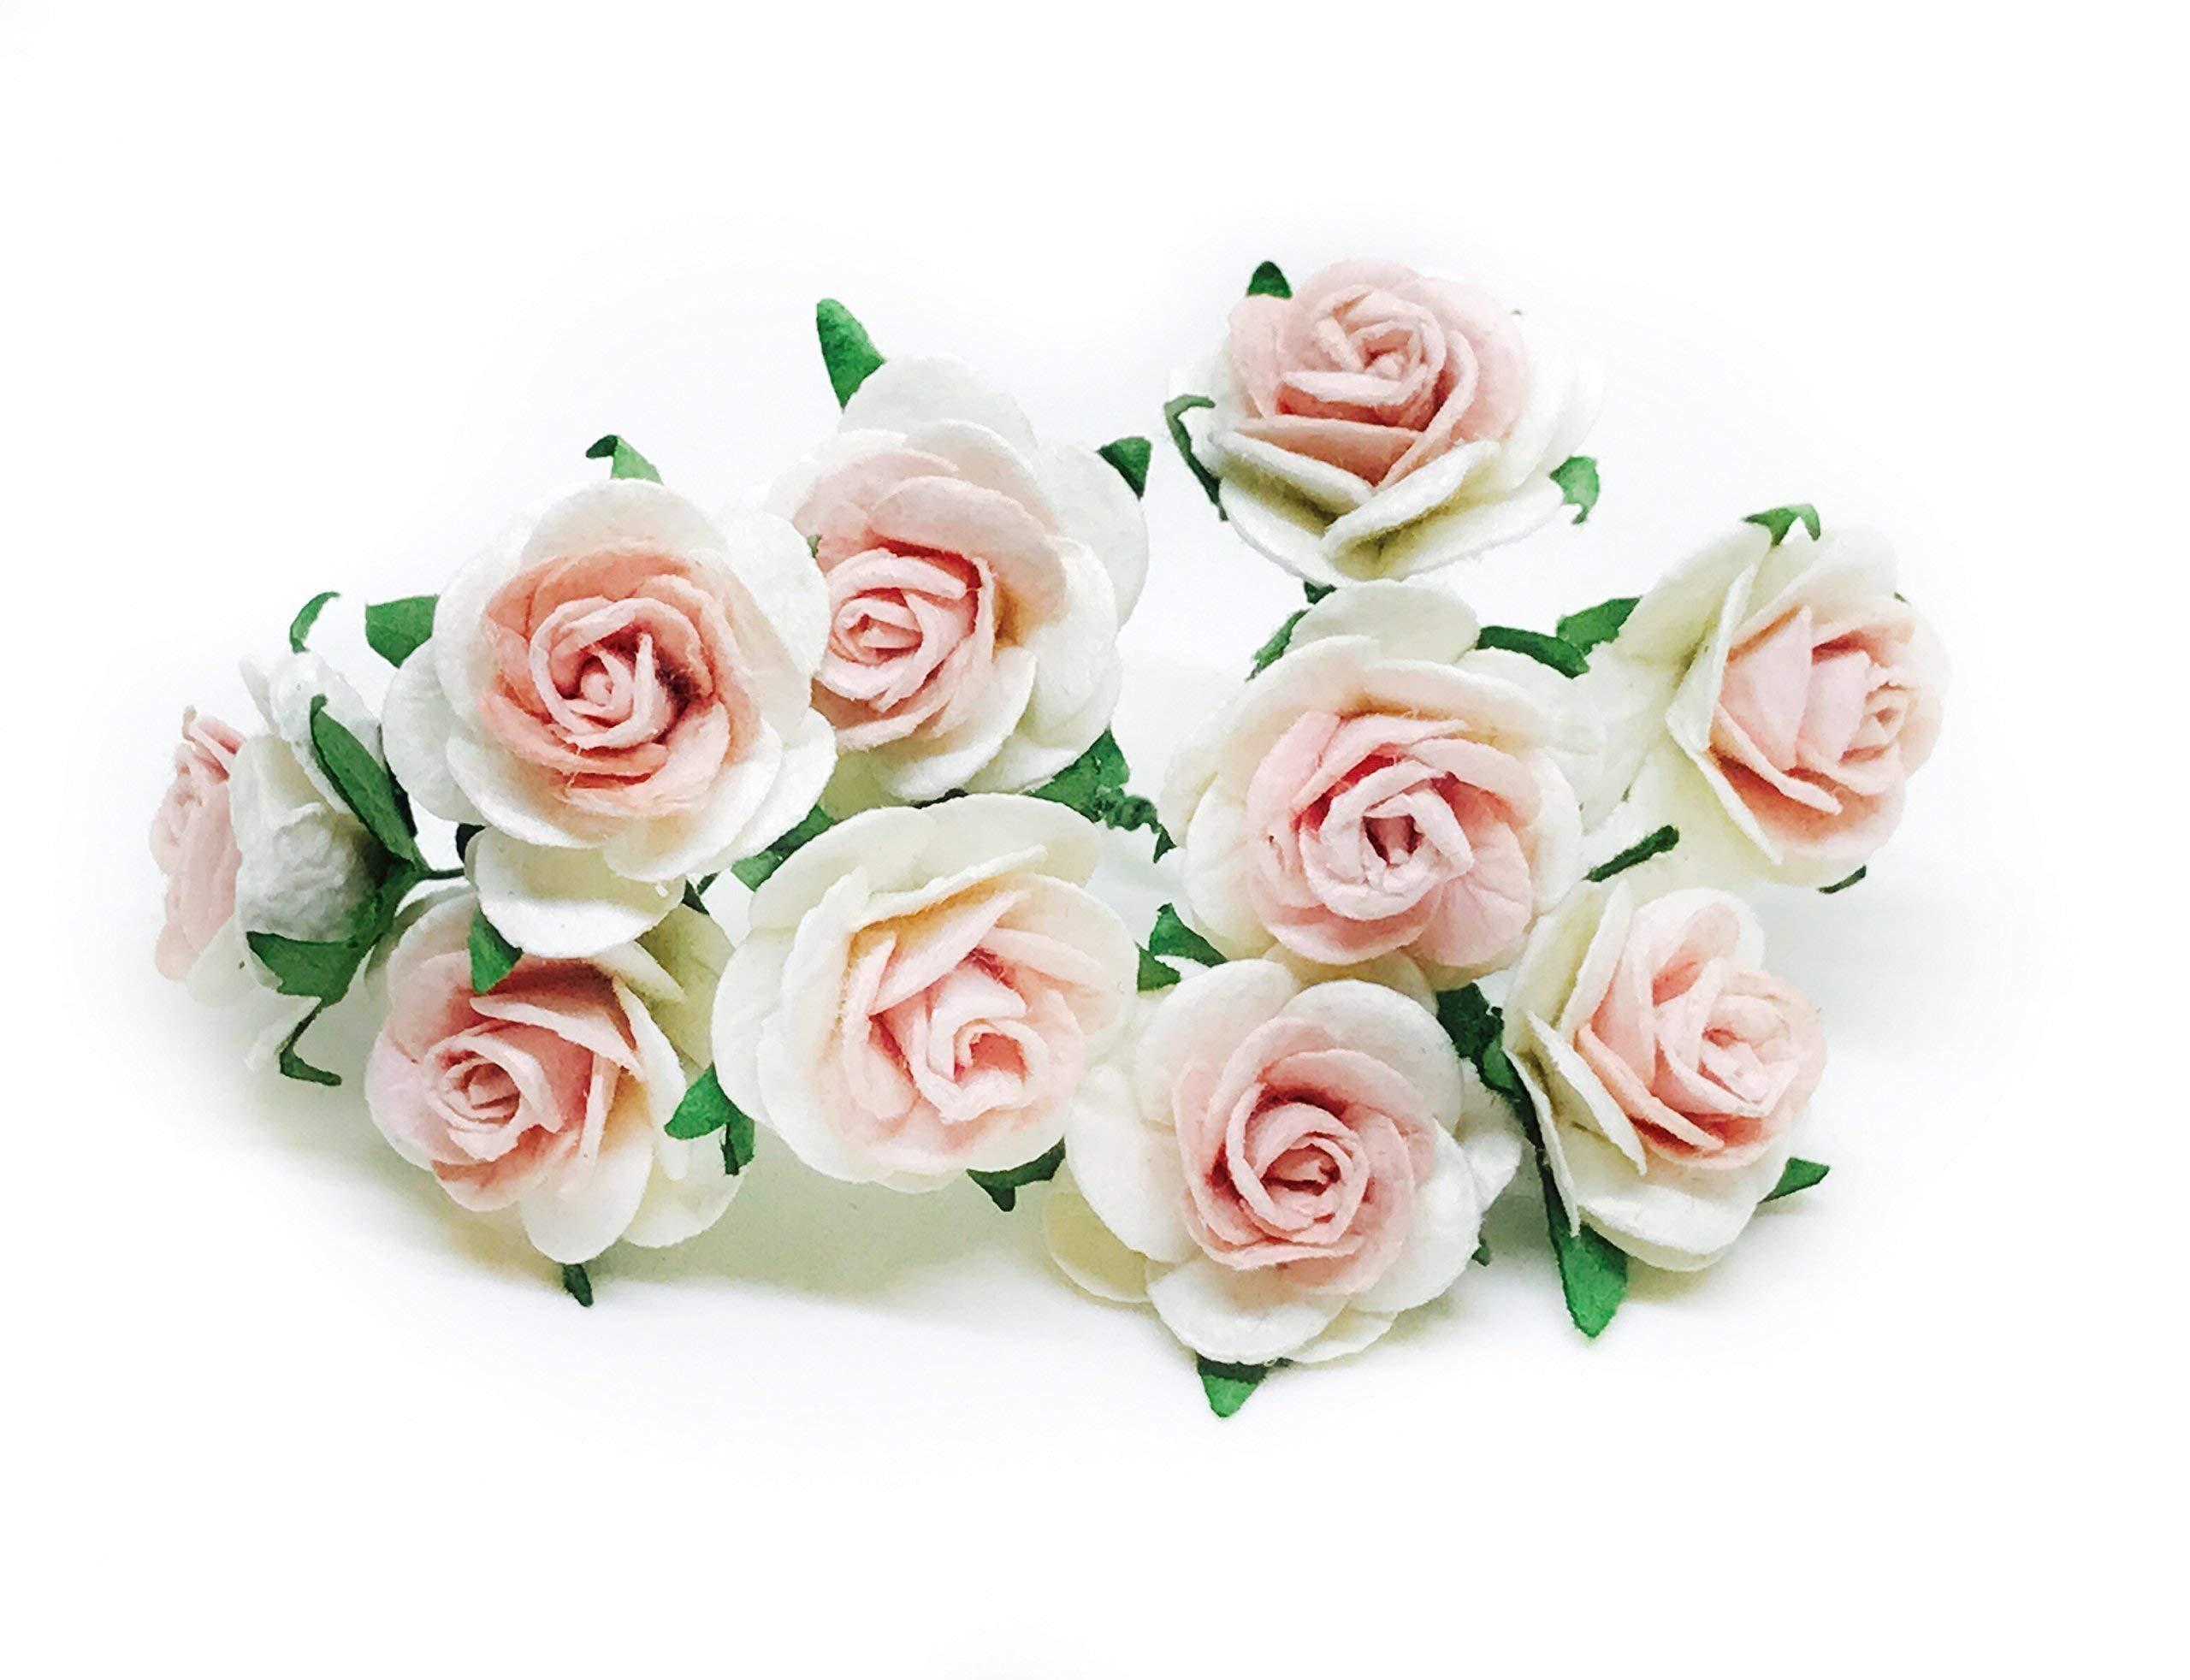 1 White Blush Paper Flowers Paper Rose Artificial Flowers Fake Flowers Artificial Roses Paper Craft Flowers Paper Rose Flower Mulberry Paper Flowers